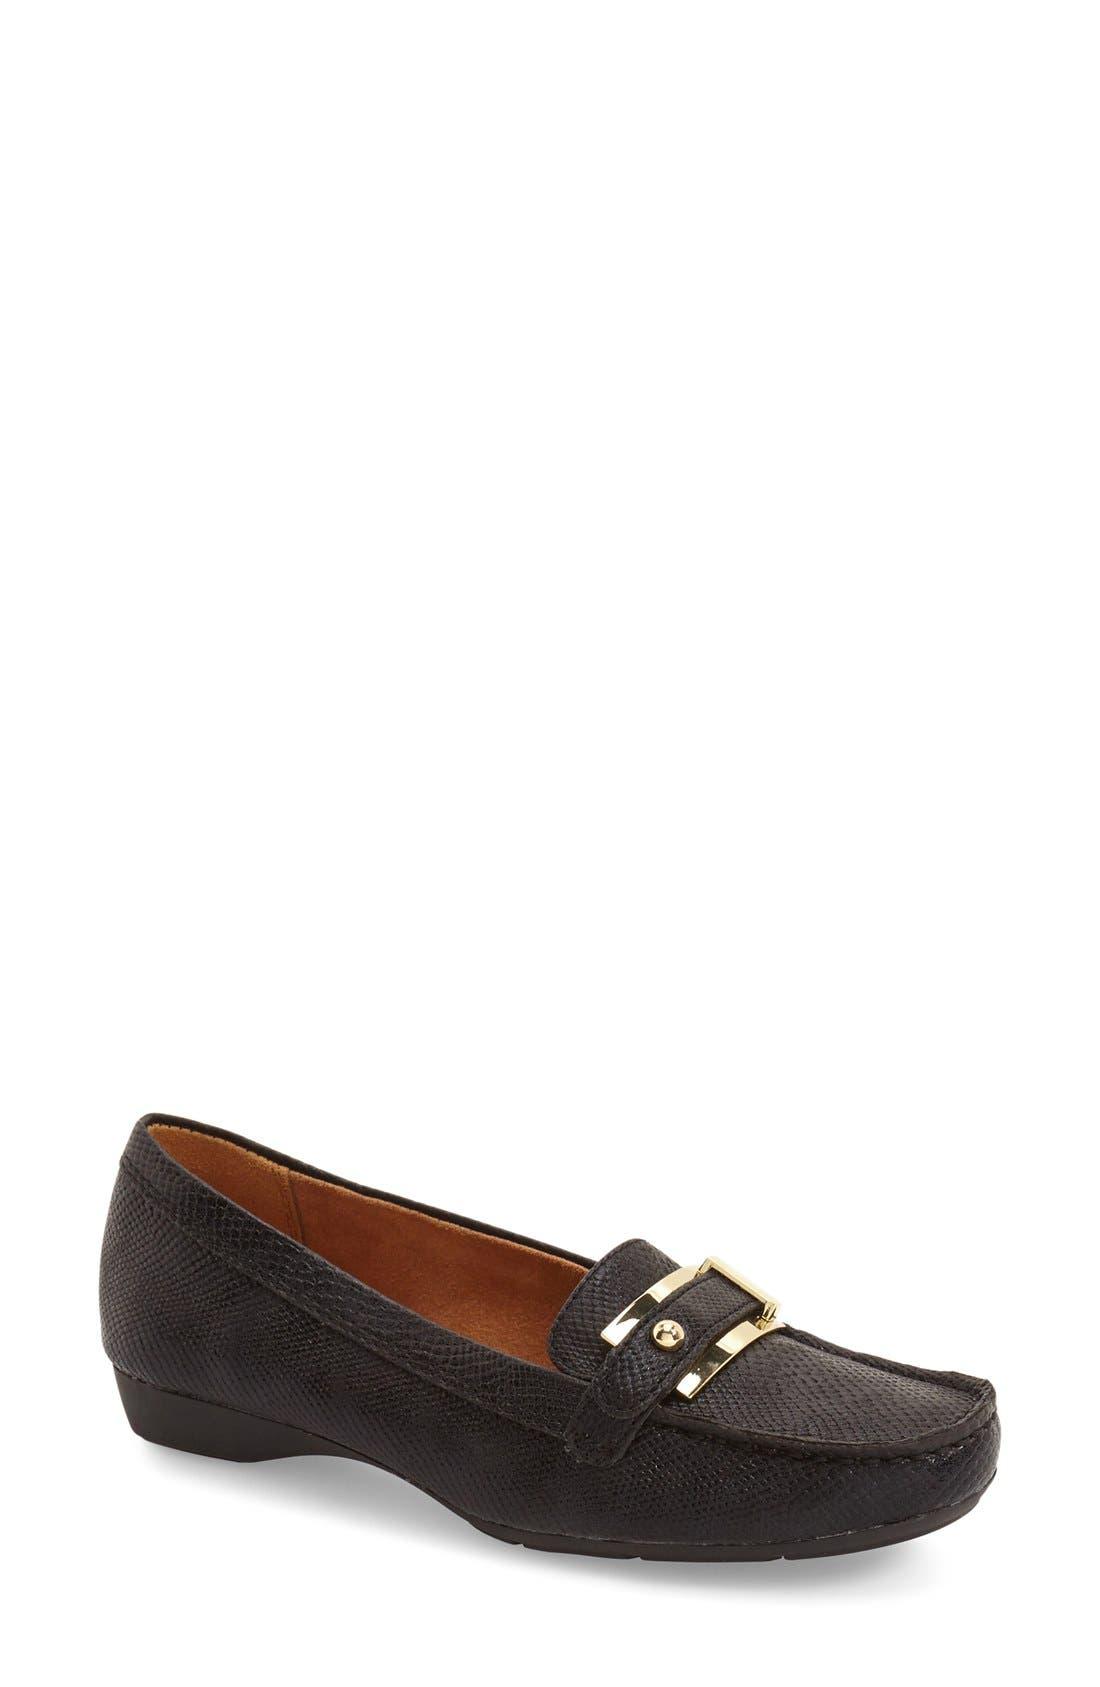 'Gisella' Loafer,                         Main,                         color, BLACK PRINTED LIZARD